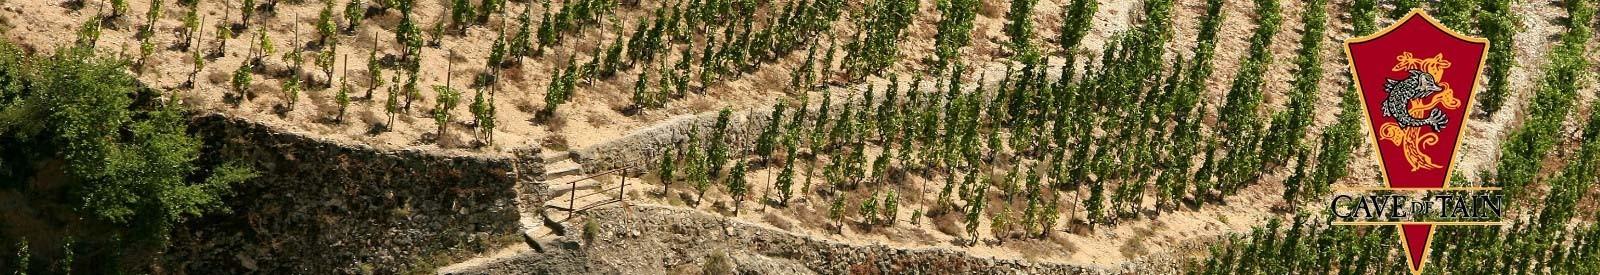 Cave de Tain - Crozes-Hermitage – Vin Bio